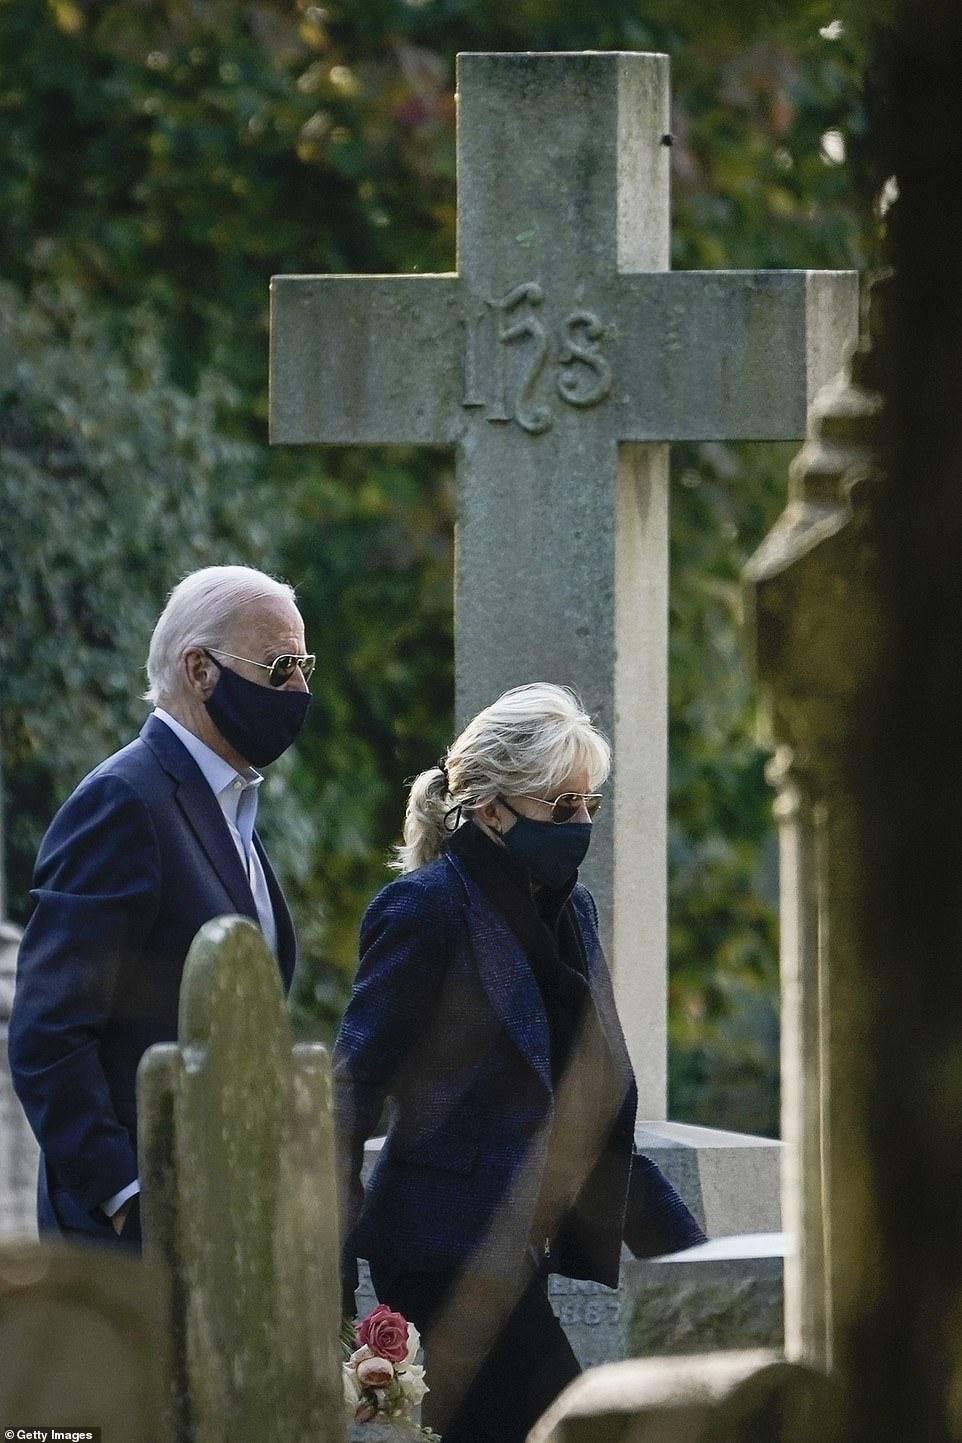 Democratic candidate Joe Biden (left) and wife Jill Biden (right) arrive for Sunday mass at St. Joseph's in Brandywine.